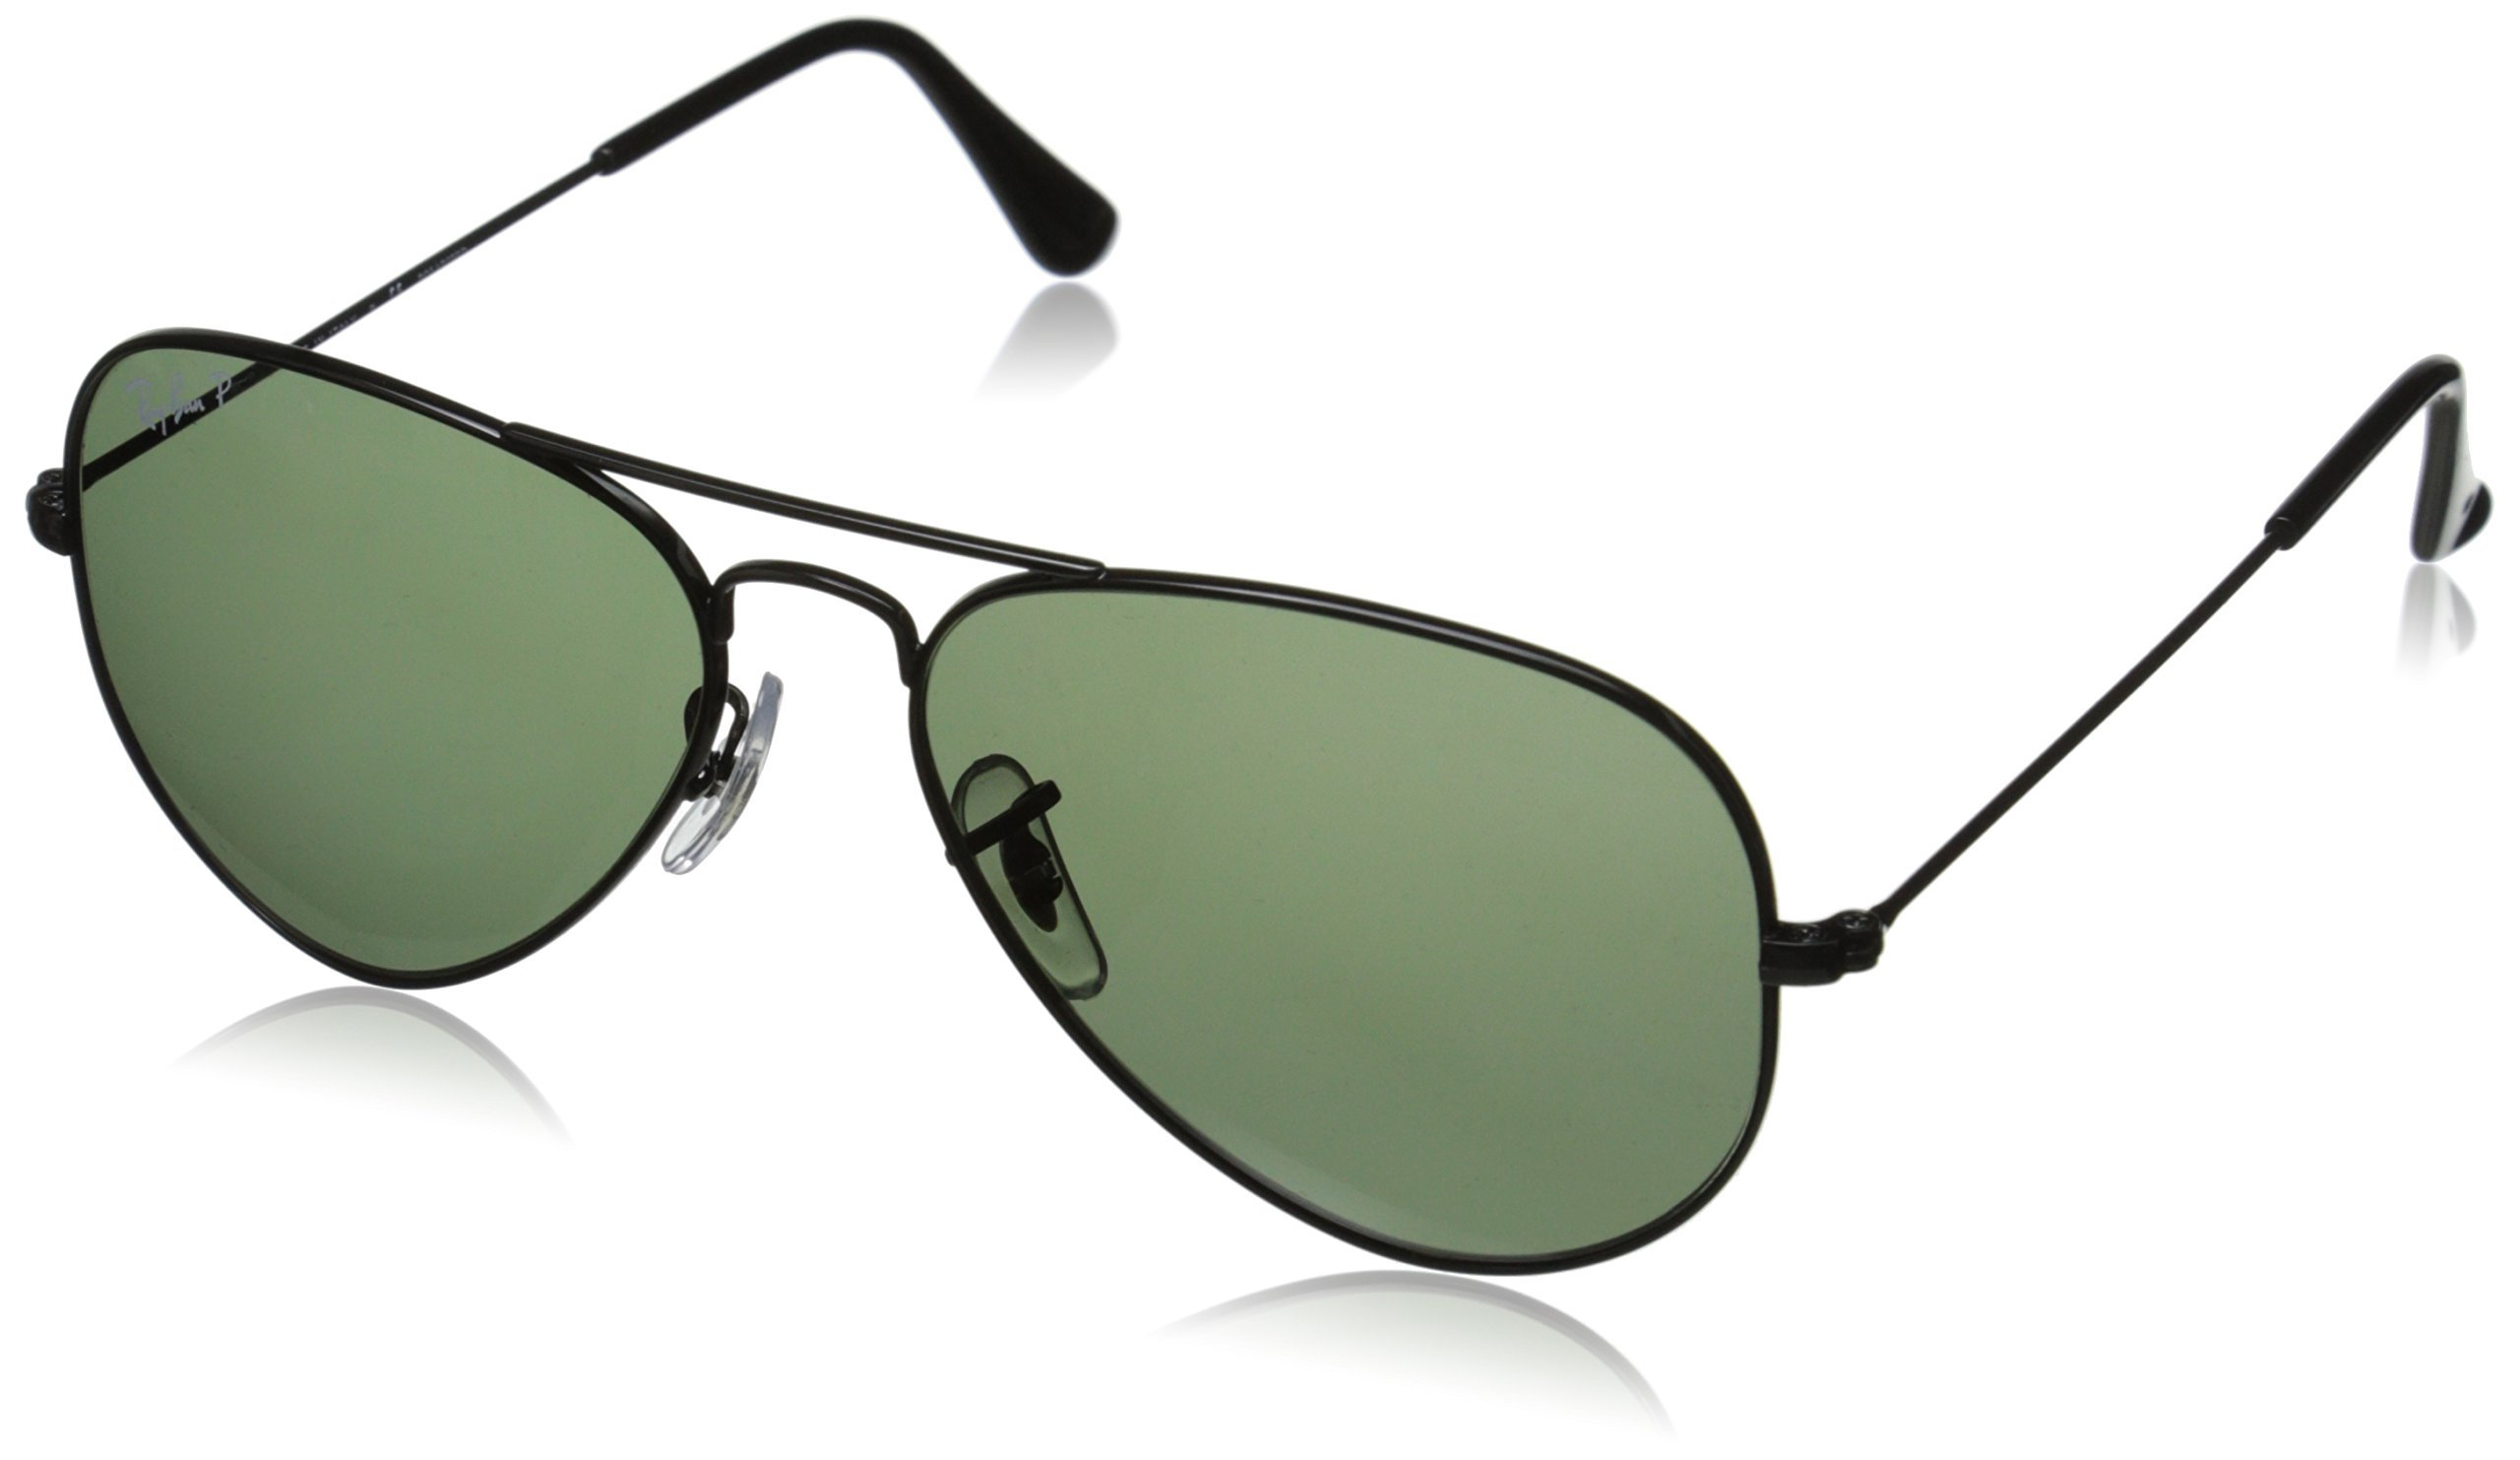 Ray-Ban AVIATOR LARGE METAL - BLACK Frame CRYSTAL GREEN POLARIZED Lenses 55mm Polarized